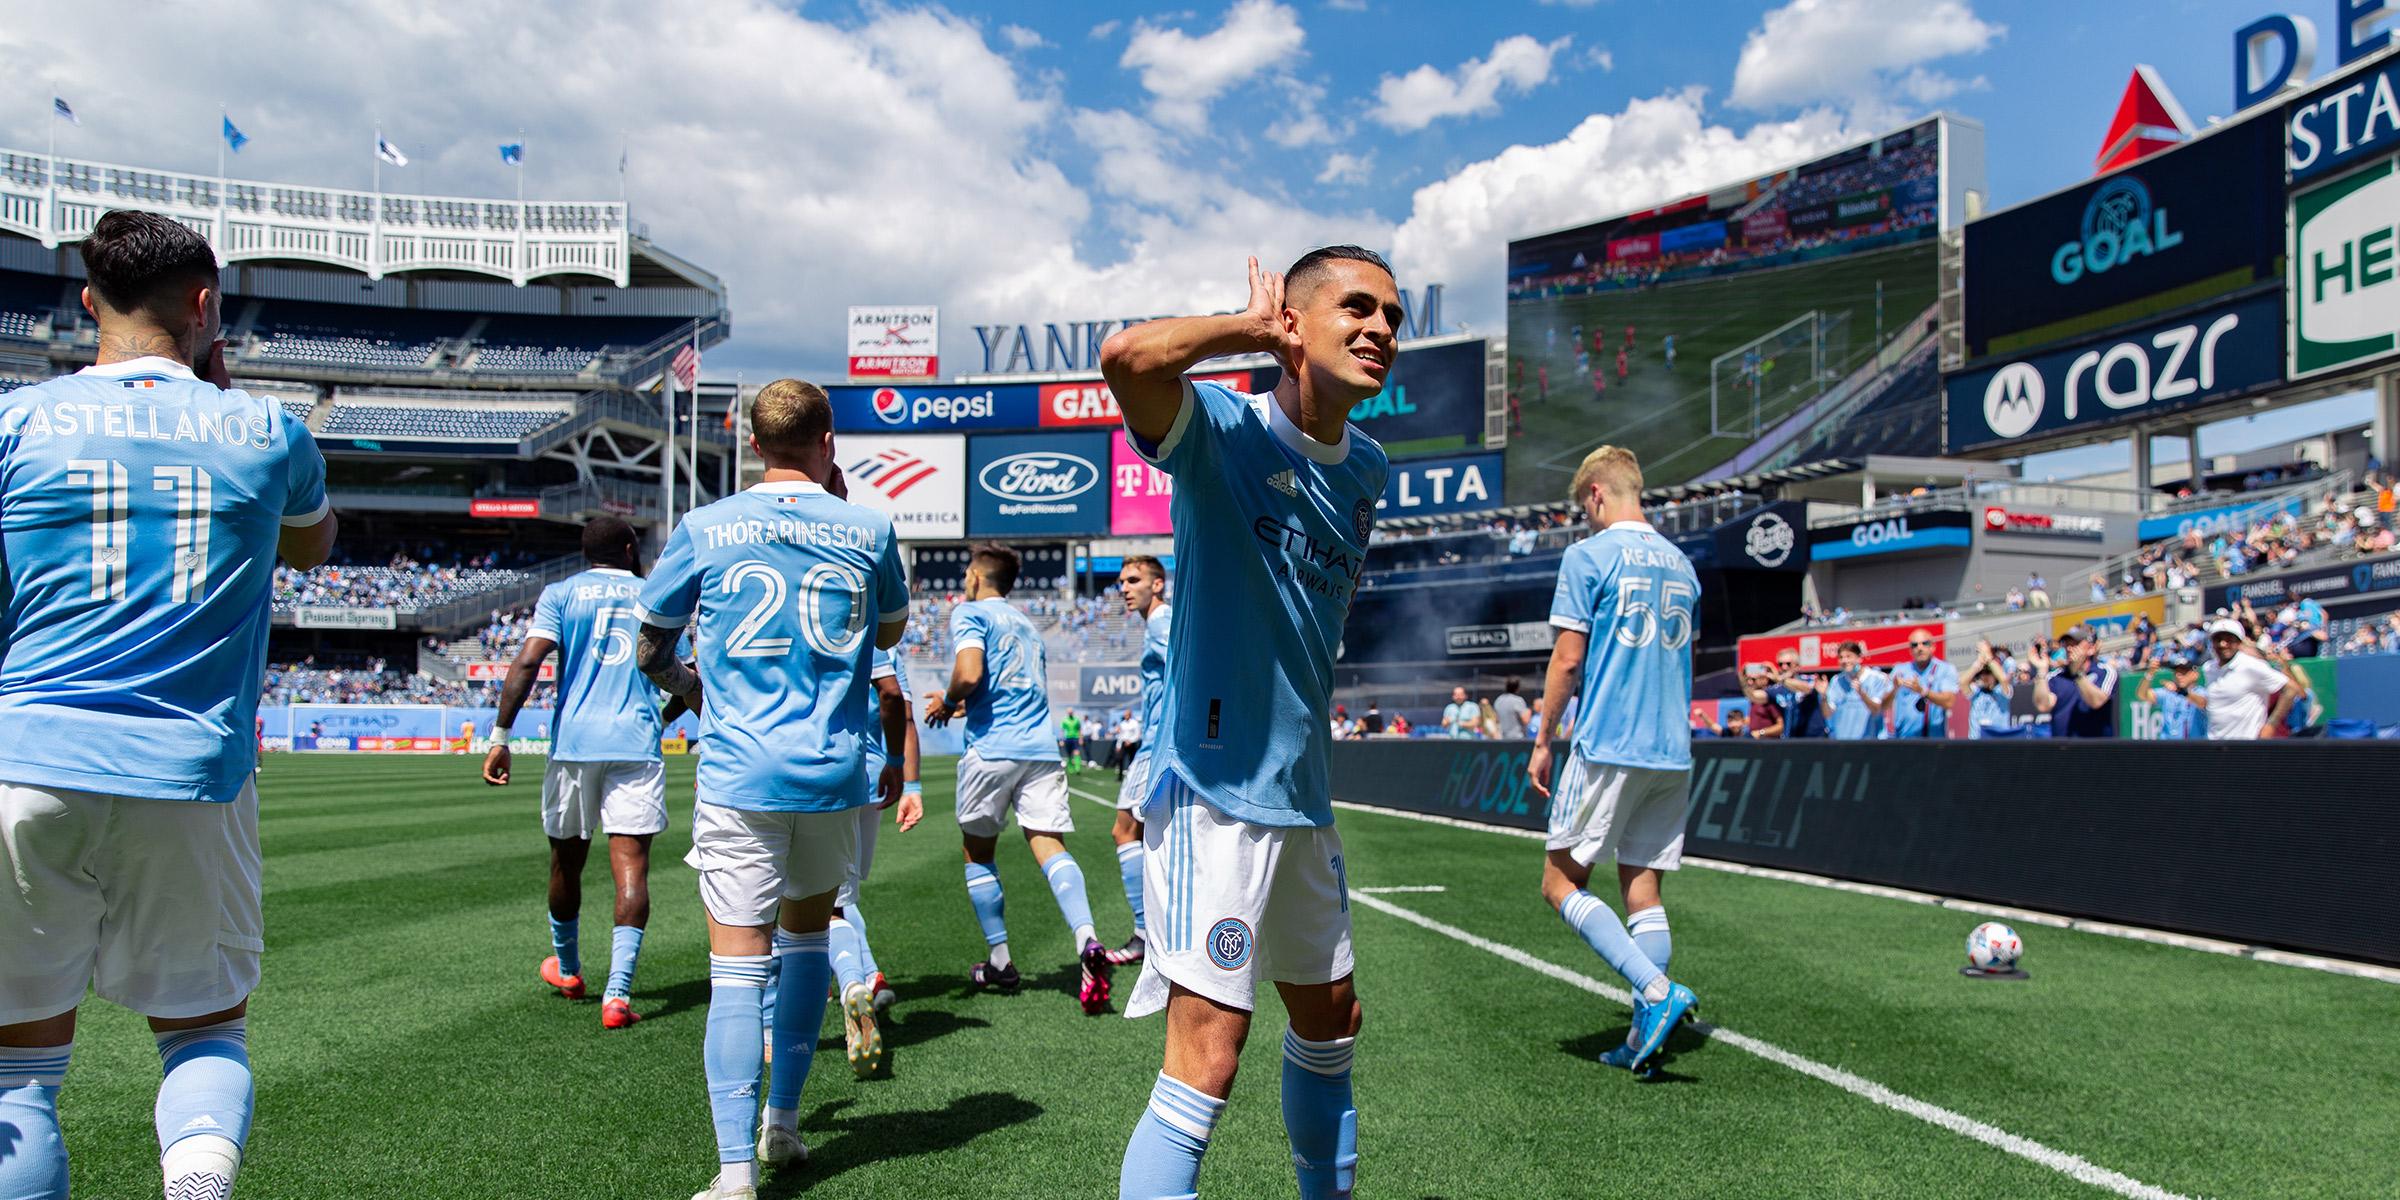 NYCFC Team Players